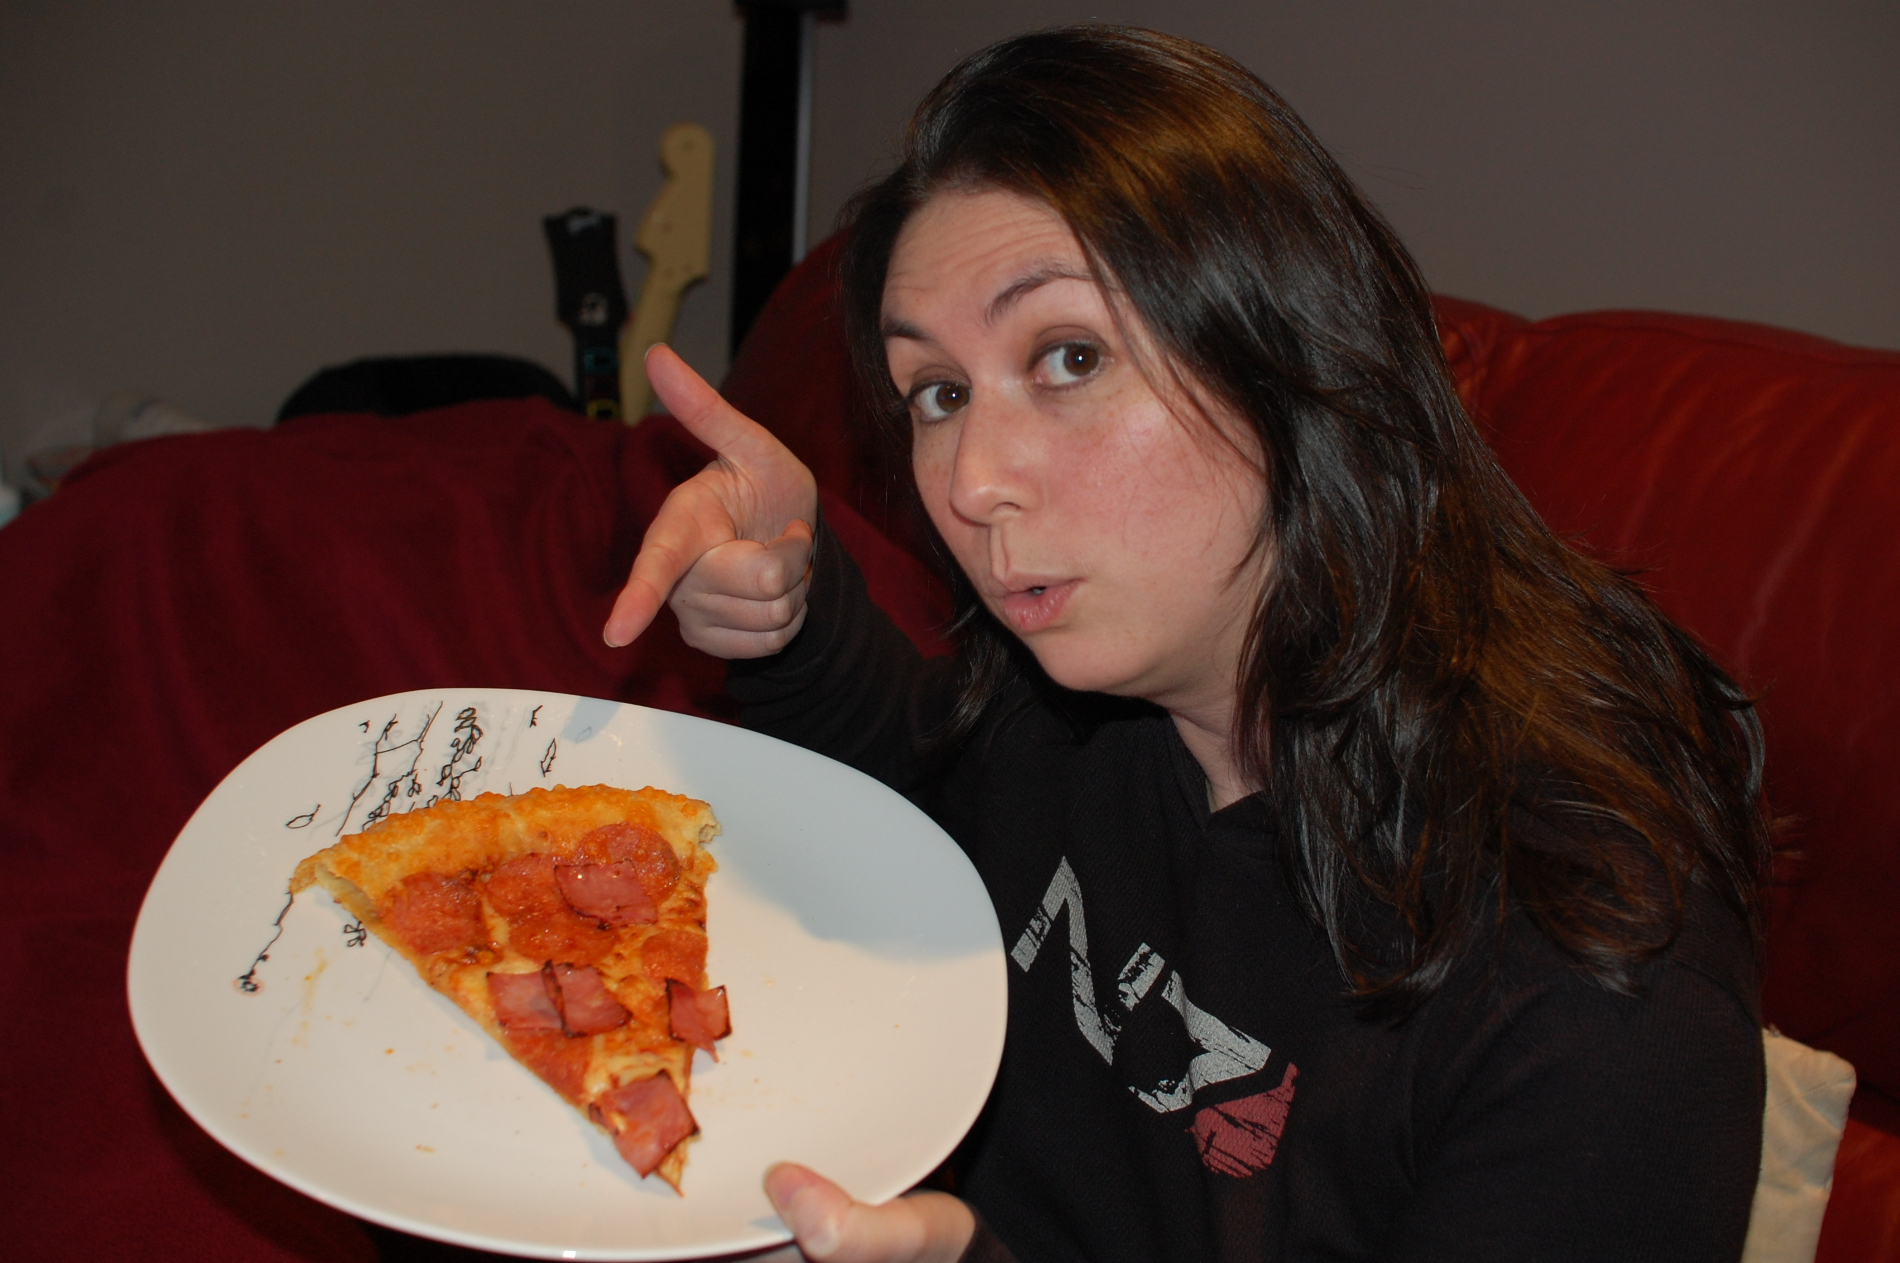 Halo 4 Stuffed Crust Pizza - The Slice